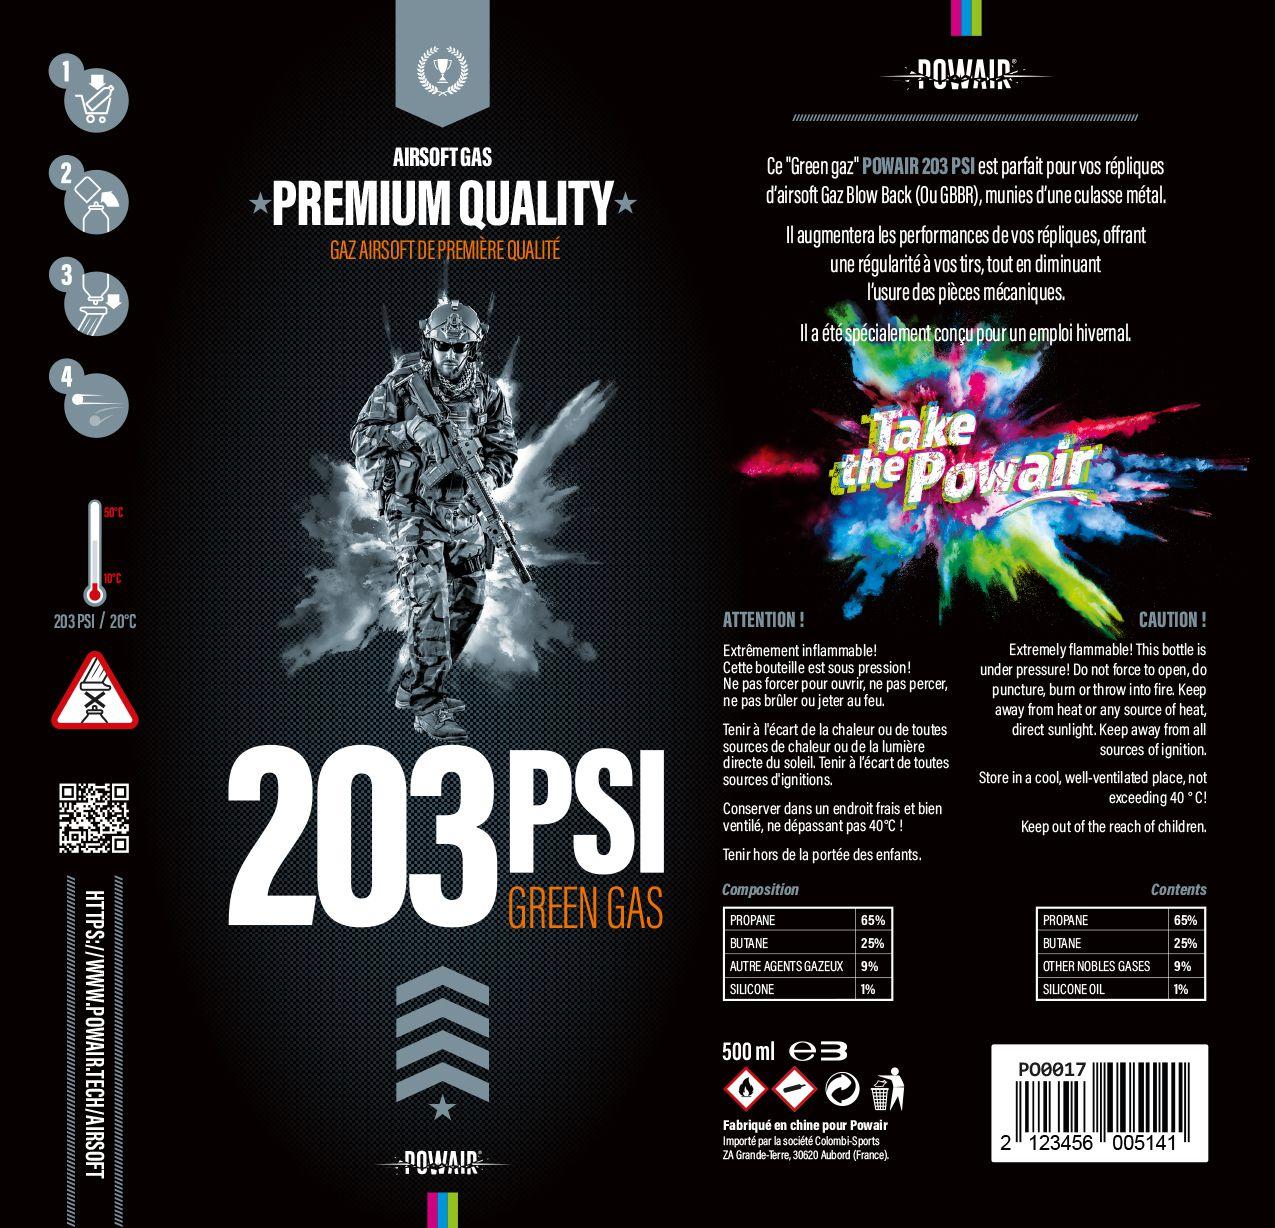 BOUTEILLE DE GAZ 500ML 203 PSI - POWAIR